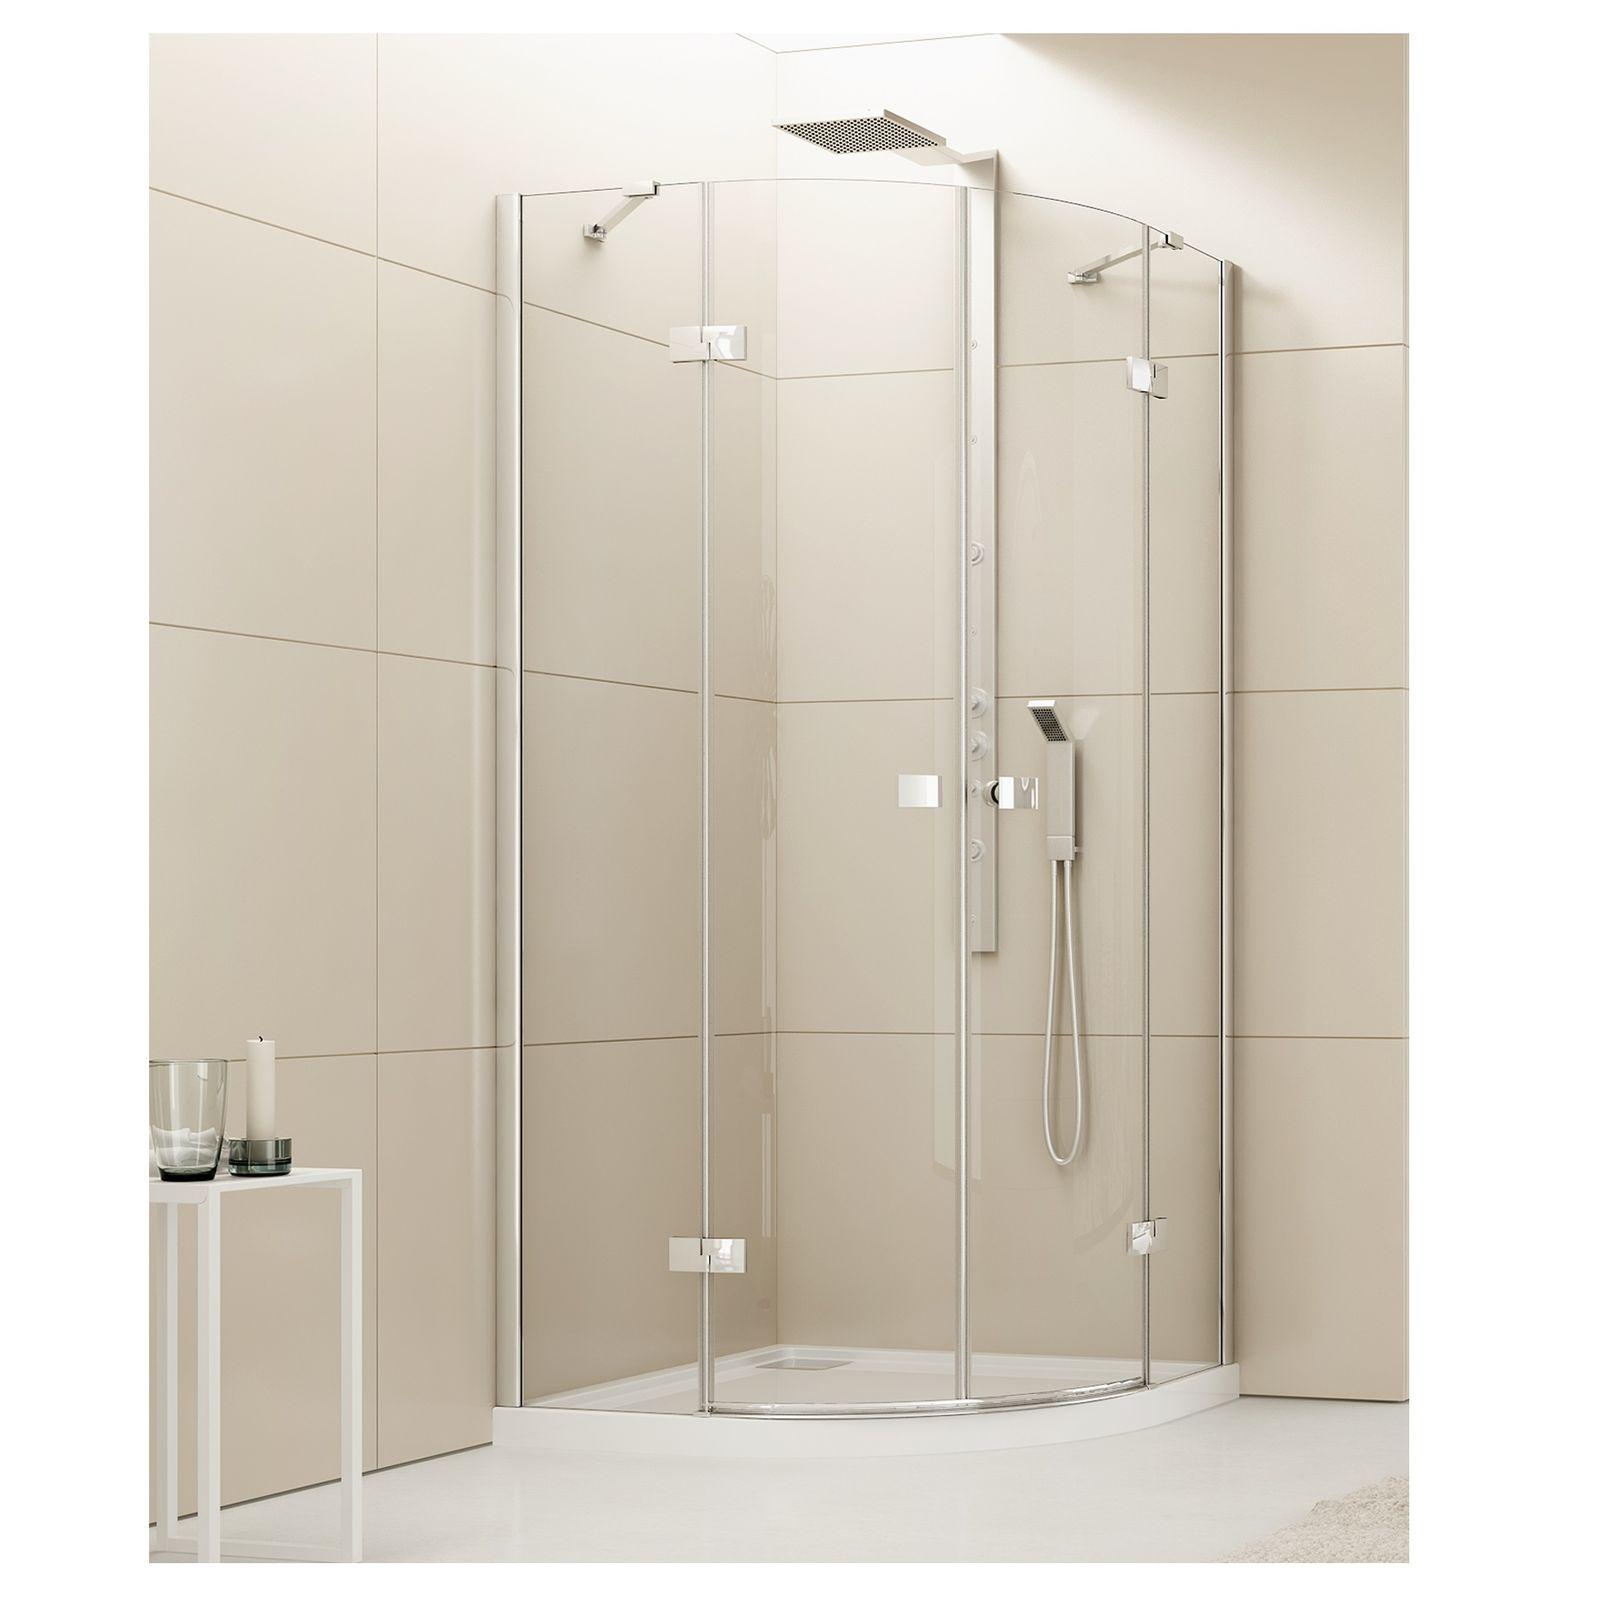 lido r55 fussboden duschwanne 80x80x6 cm halbrund. Black Bedroom Furniture Sets. Home Design Ideas